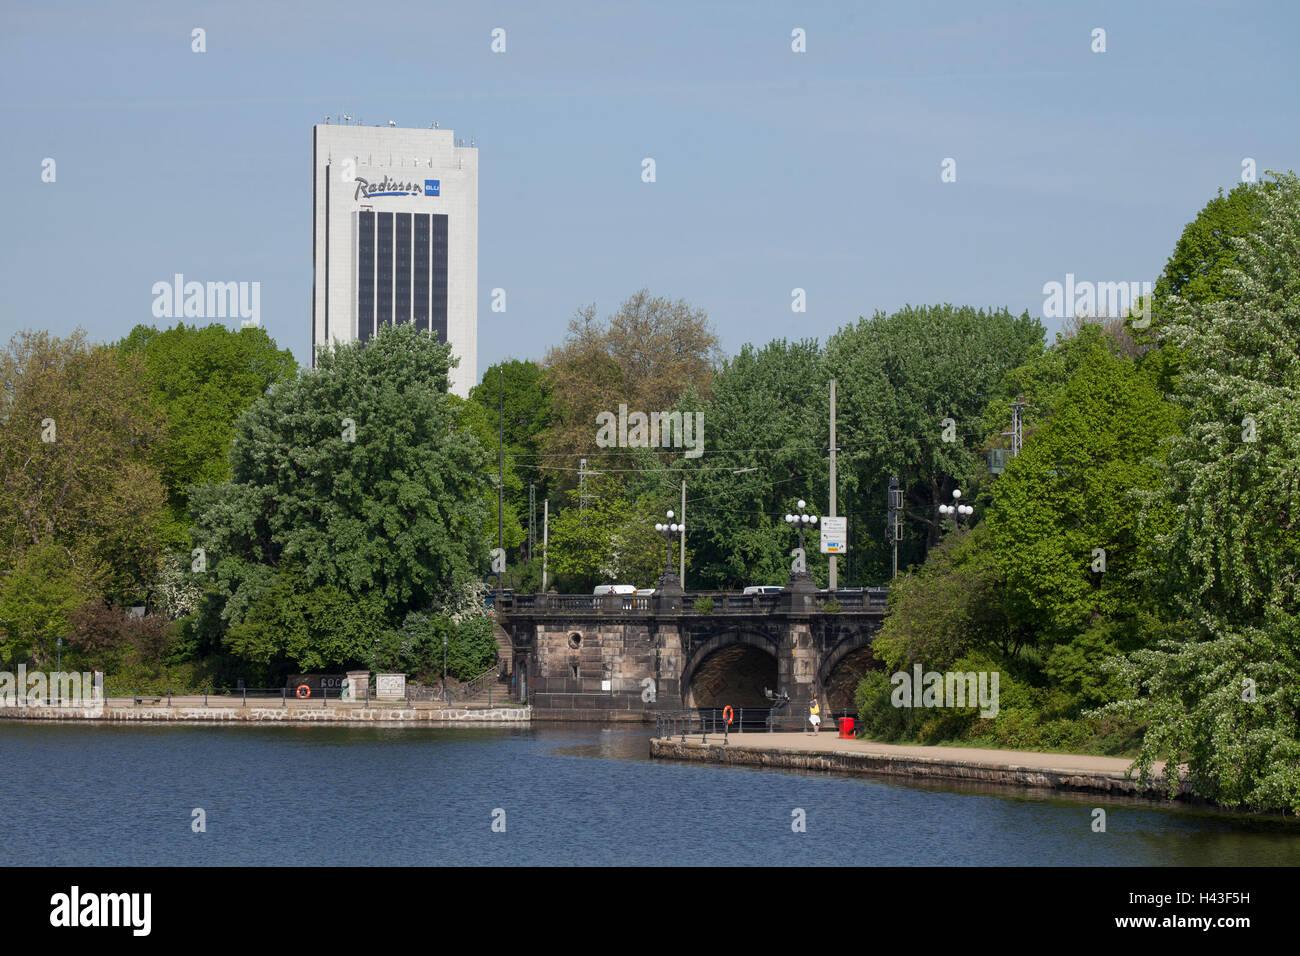 Inner Alster Lake with Radisson Blu Hotel and Lombard Bridge, Hamburg, Germany - Stock Image